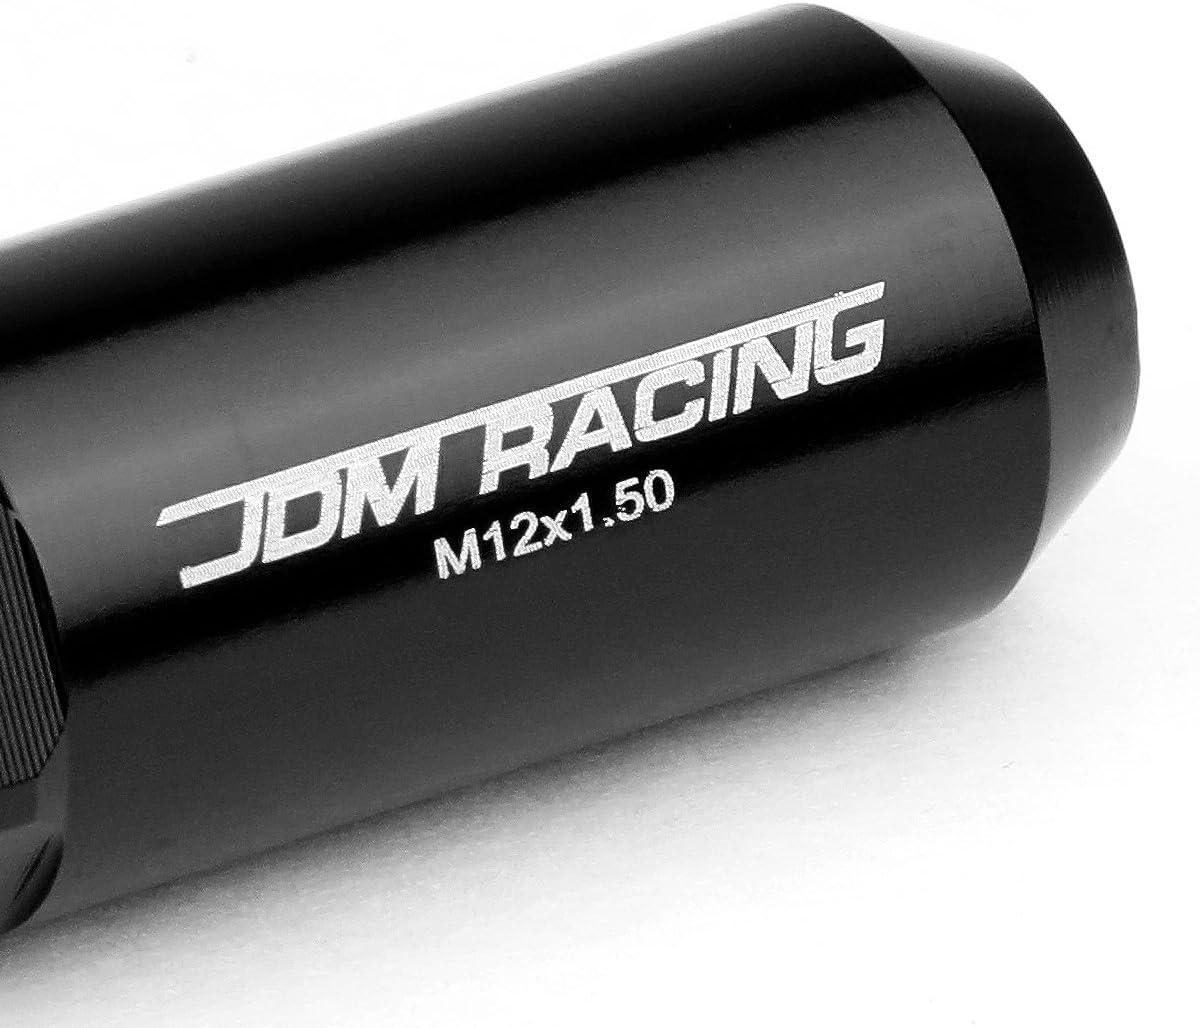 M12 x 1.5 Open//Closed End Design 20-Piece Aluminum Alloy Wheel Lug Nuts Pink 1 X Deep Drive Extension